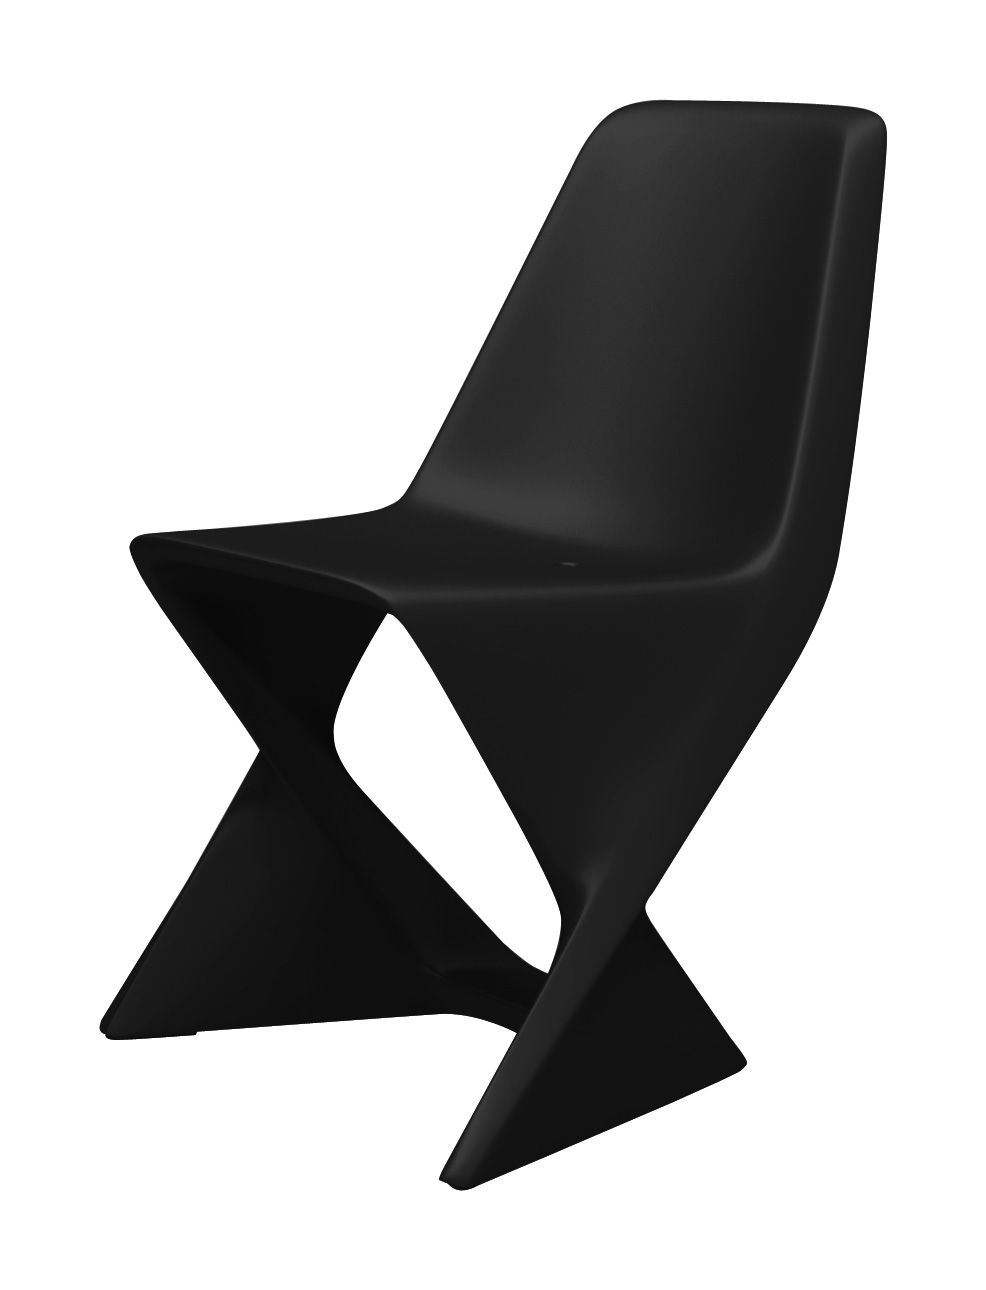 Chaise Iso Qui est Paul ? - Noir - l 48.5 x h 80 | Made In Design